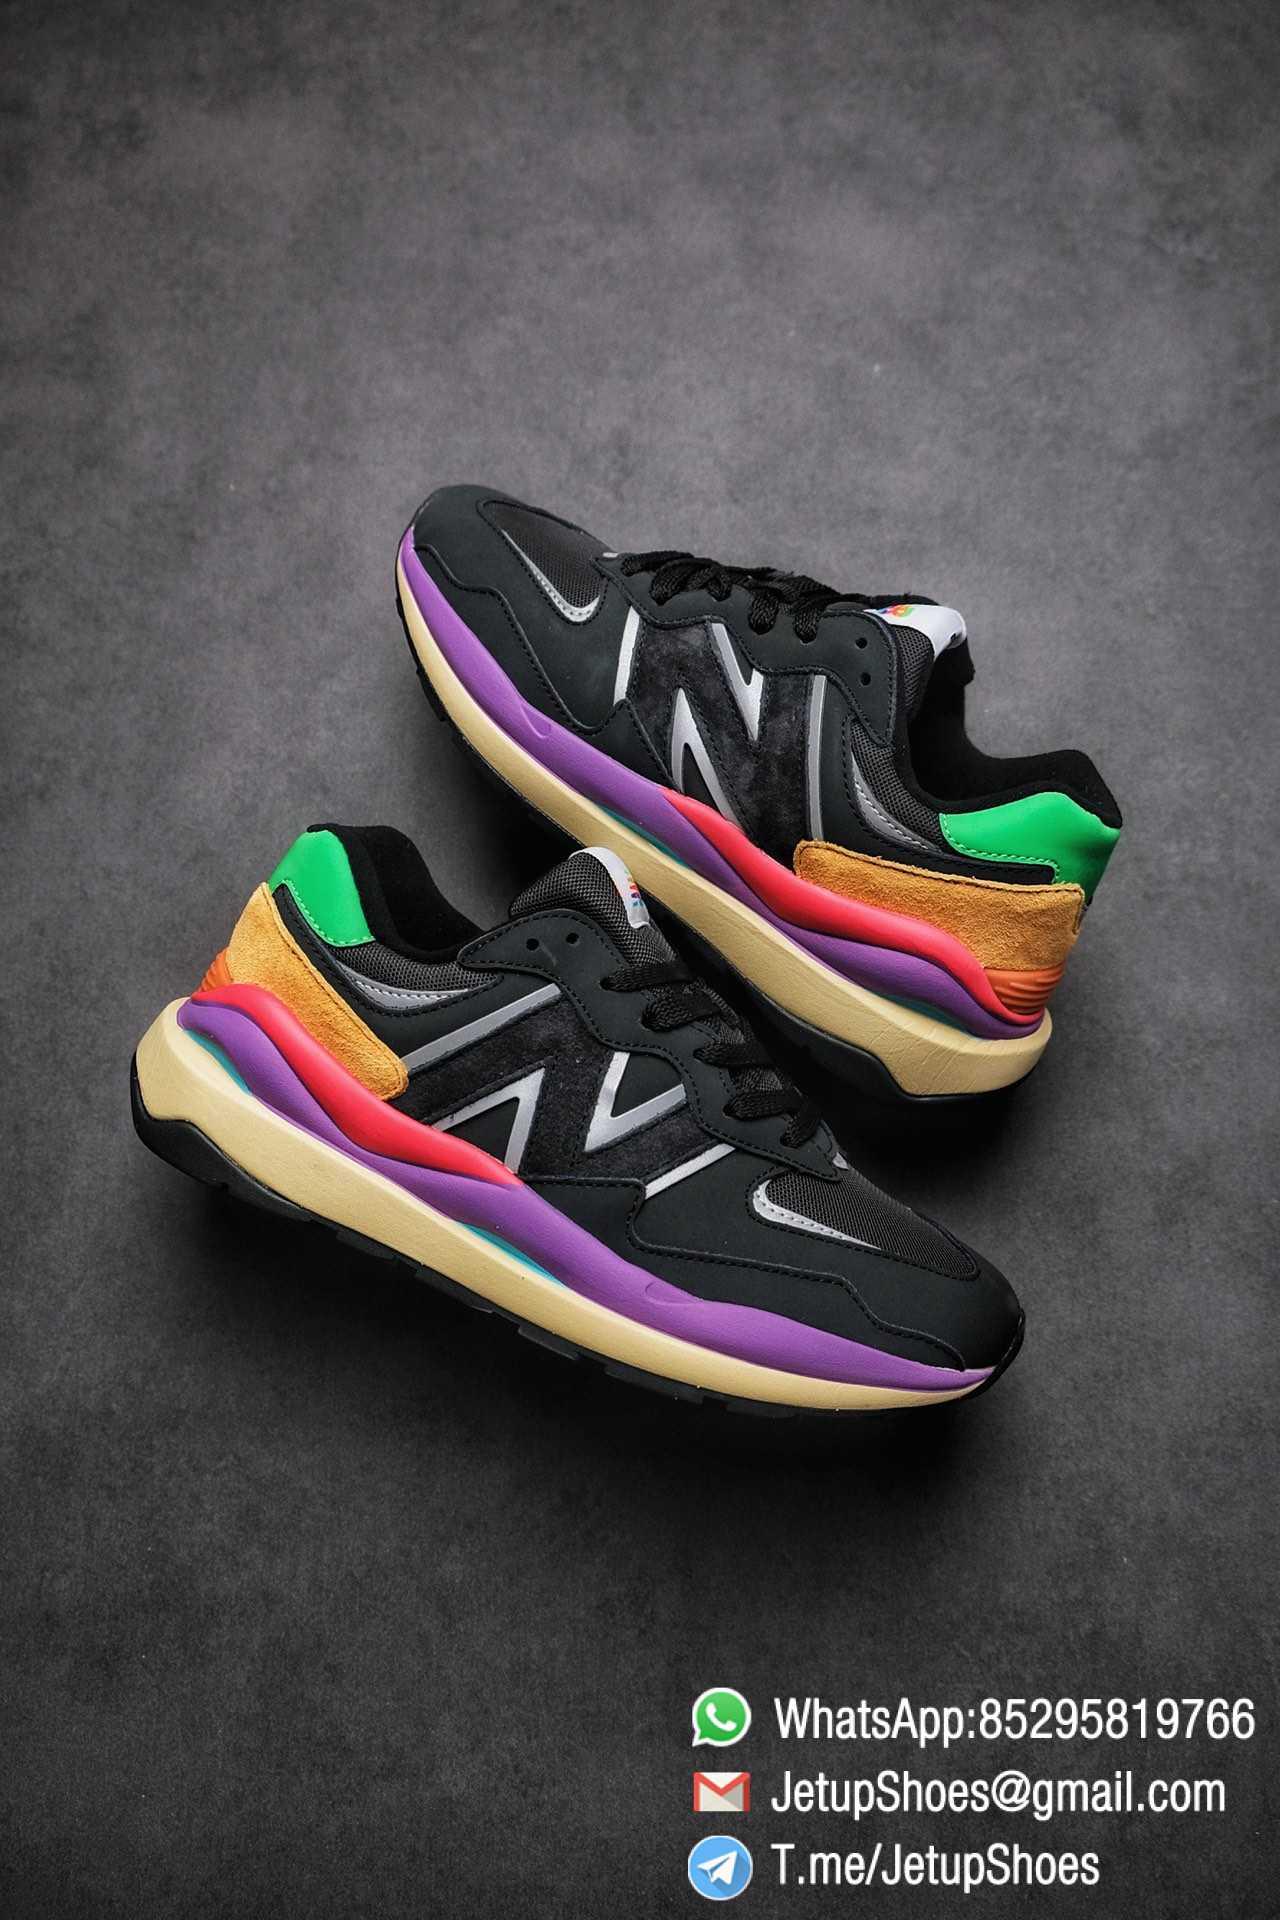 New Balance 5740 Black Multicolor Running Sneakers M5740LB Black Mesh Upper Oriange Suede Oversized N 01